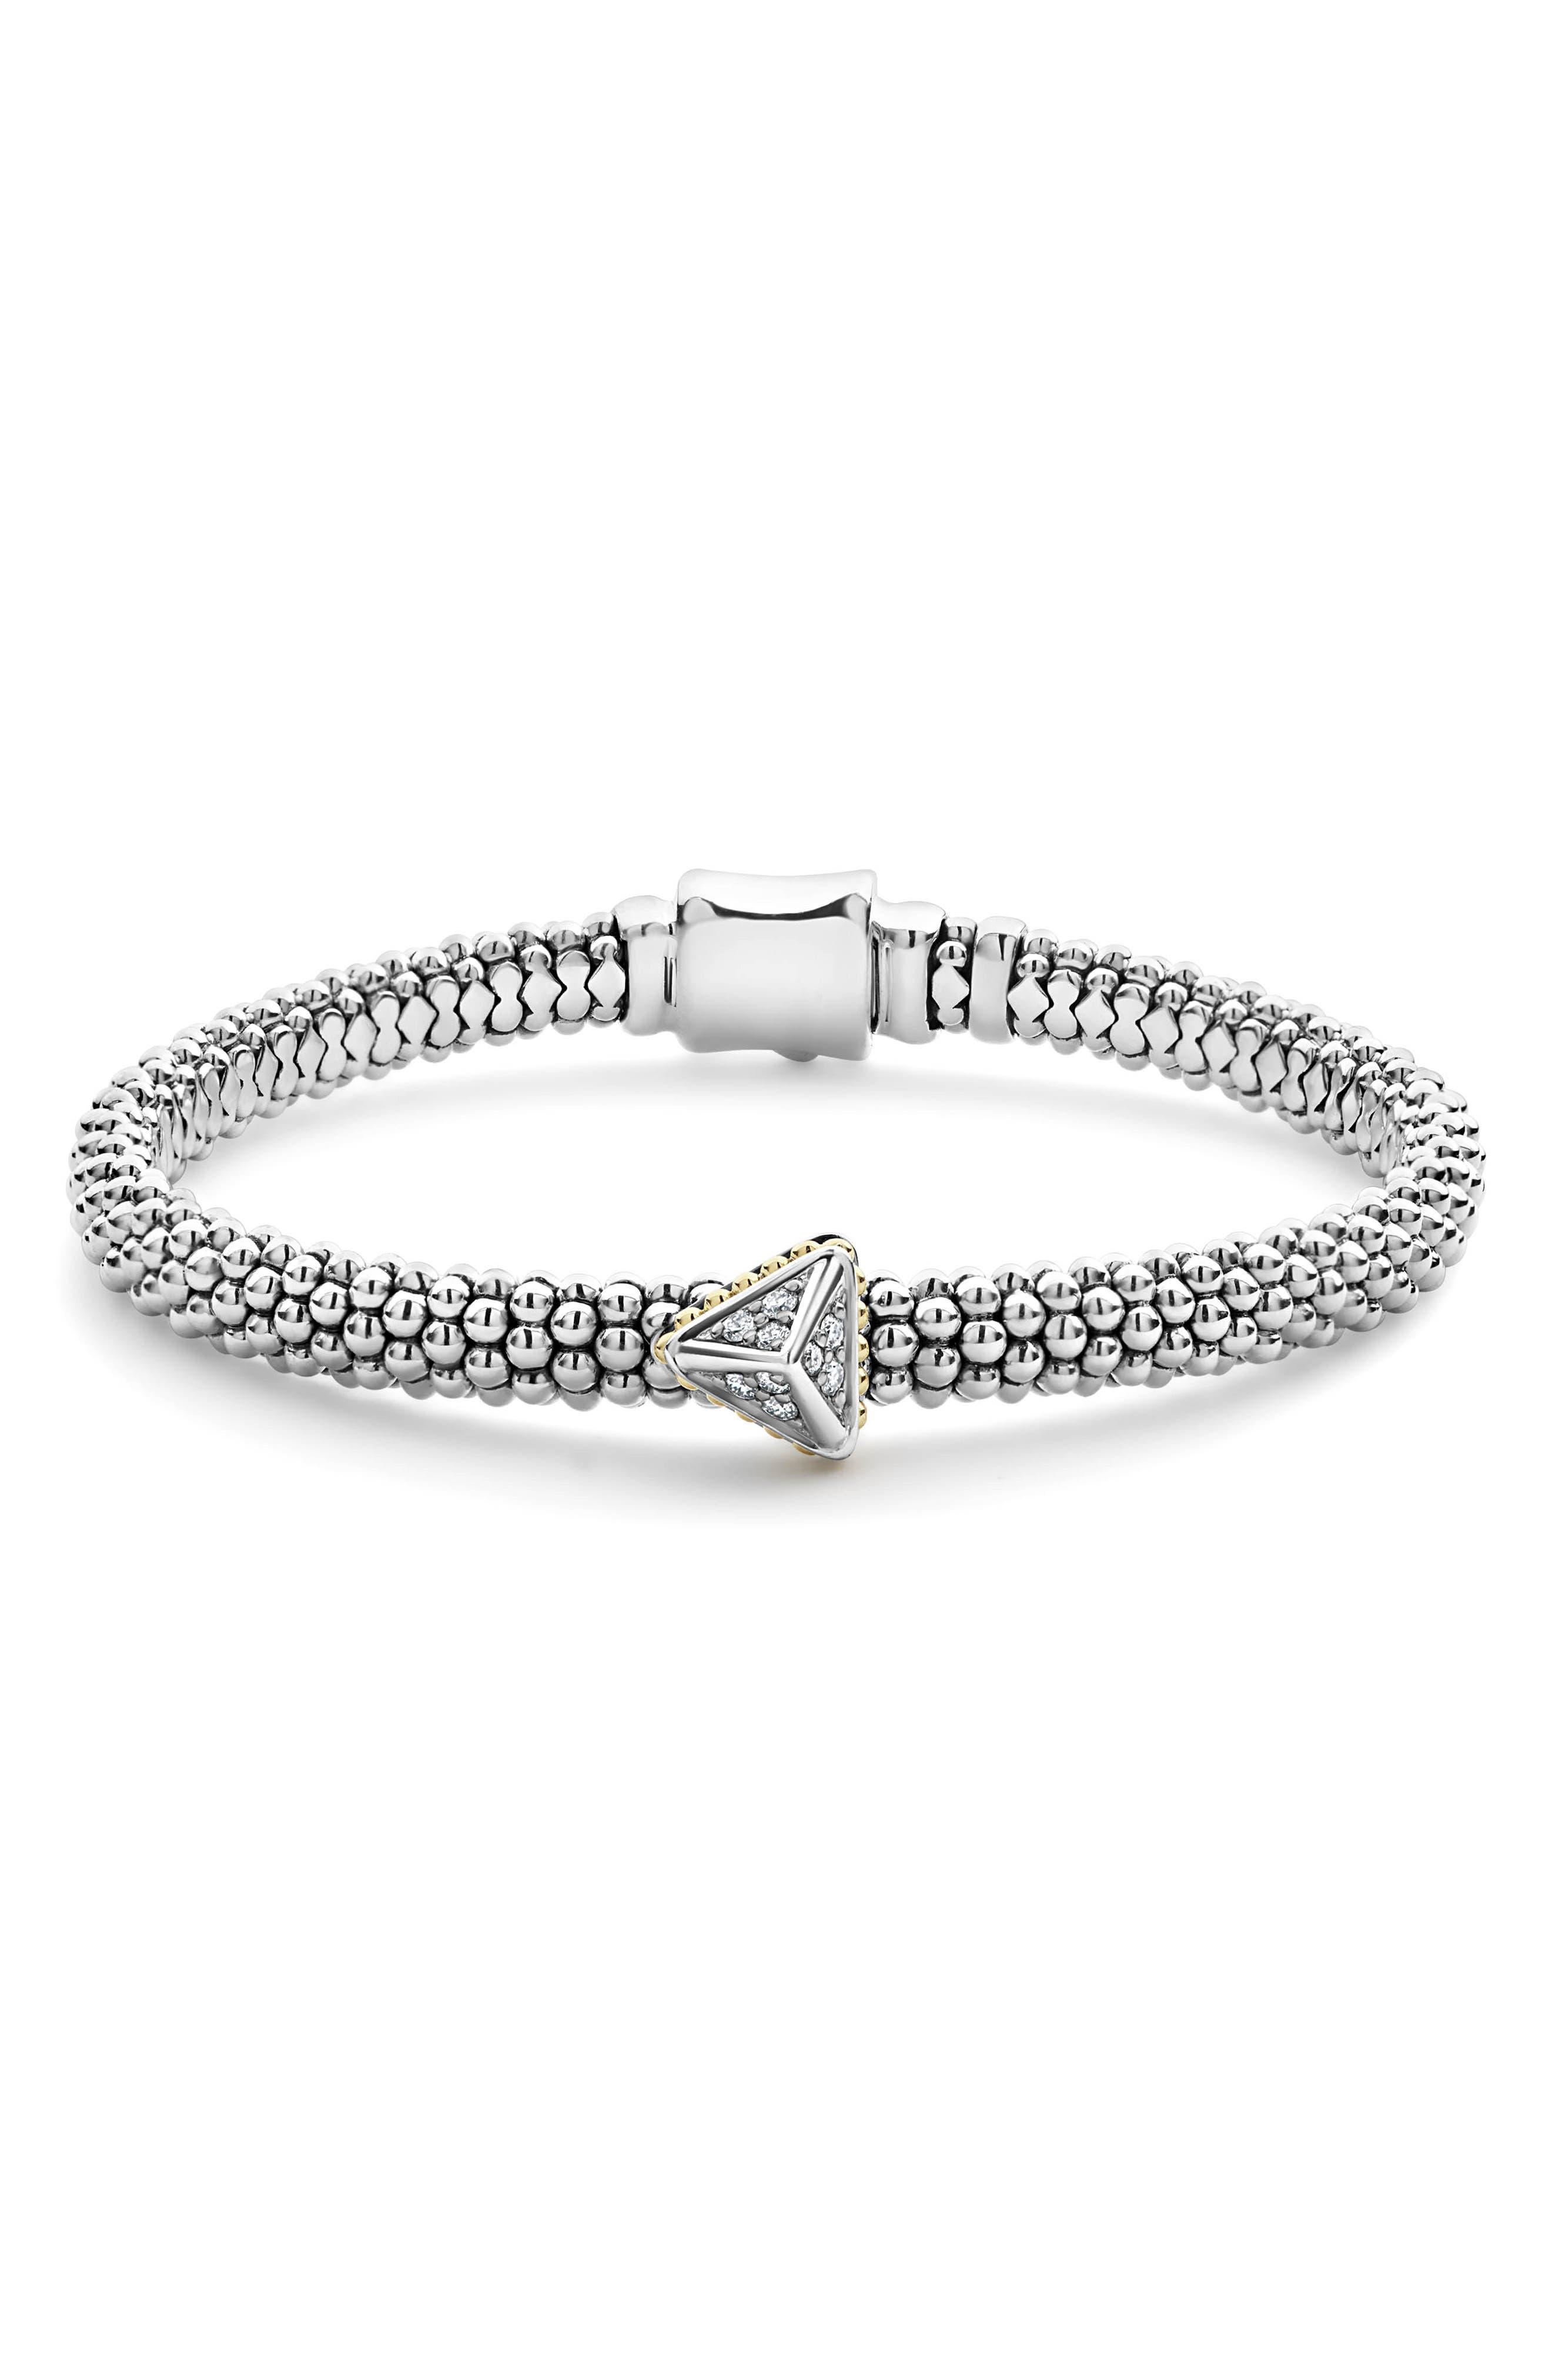 Ksl Caviar Rope Bracelet W/ Pyramid in Silver/ Diamond